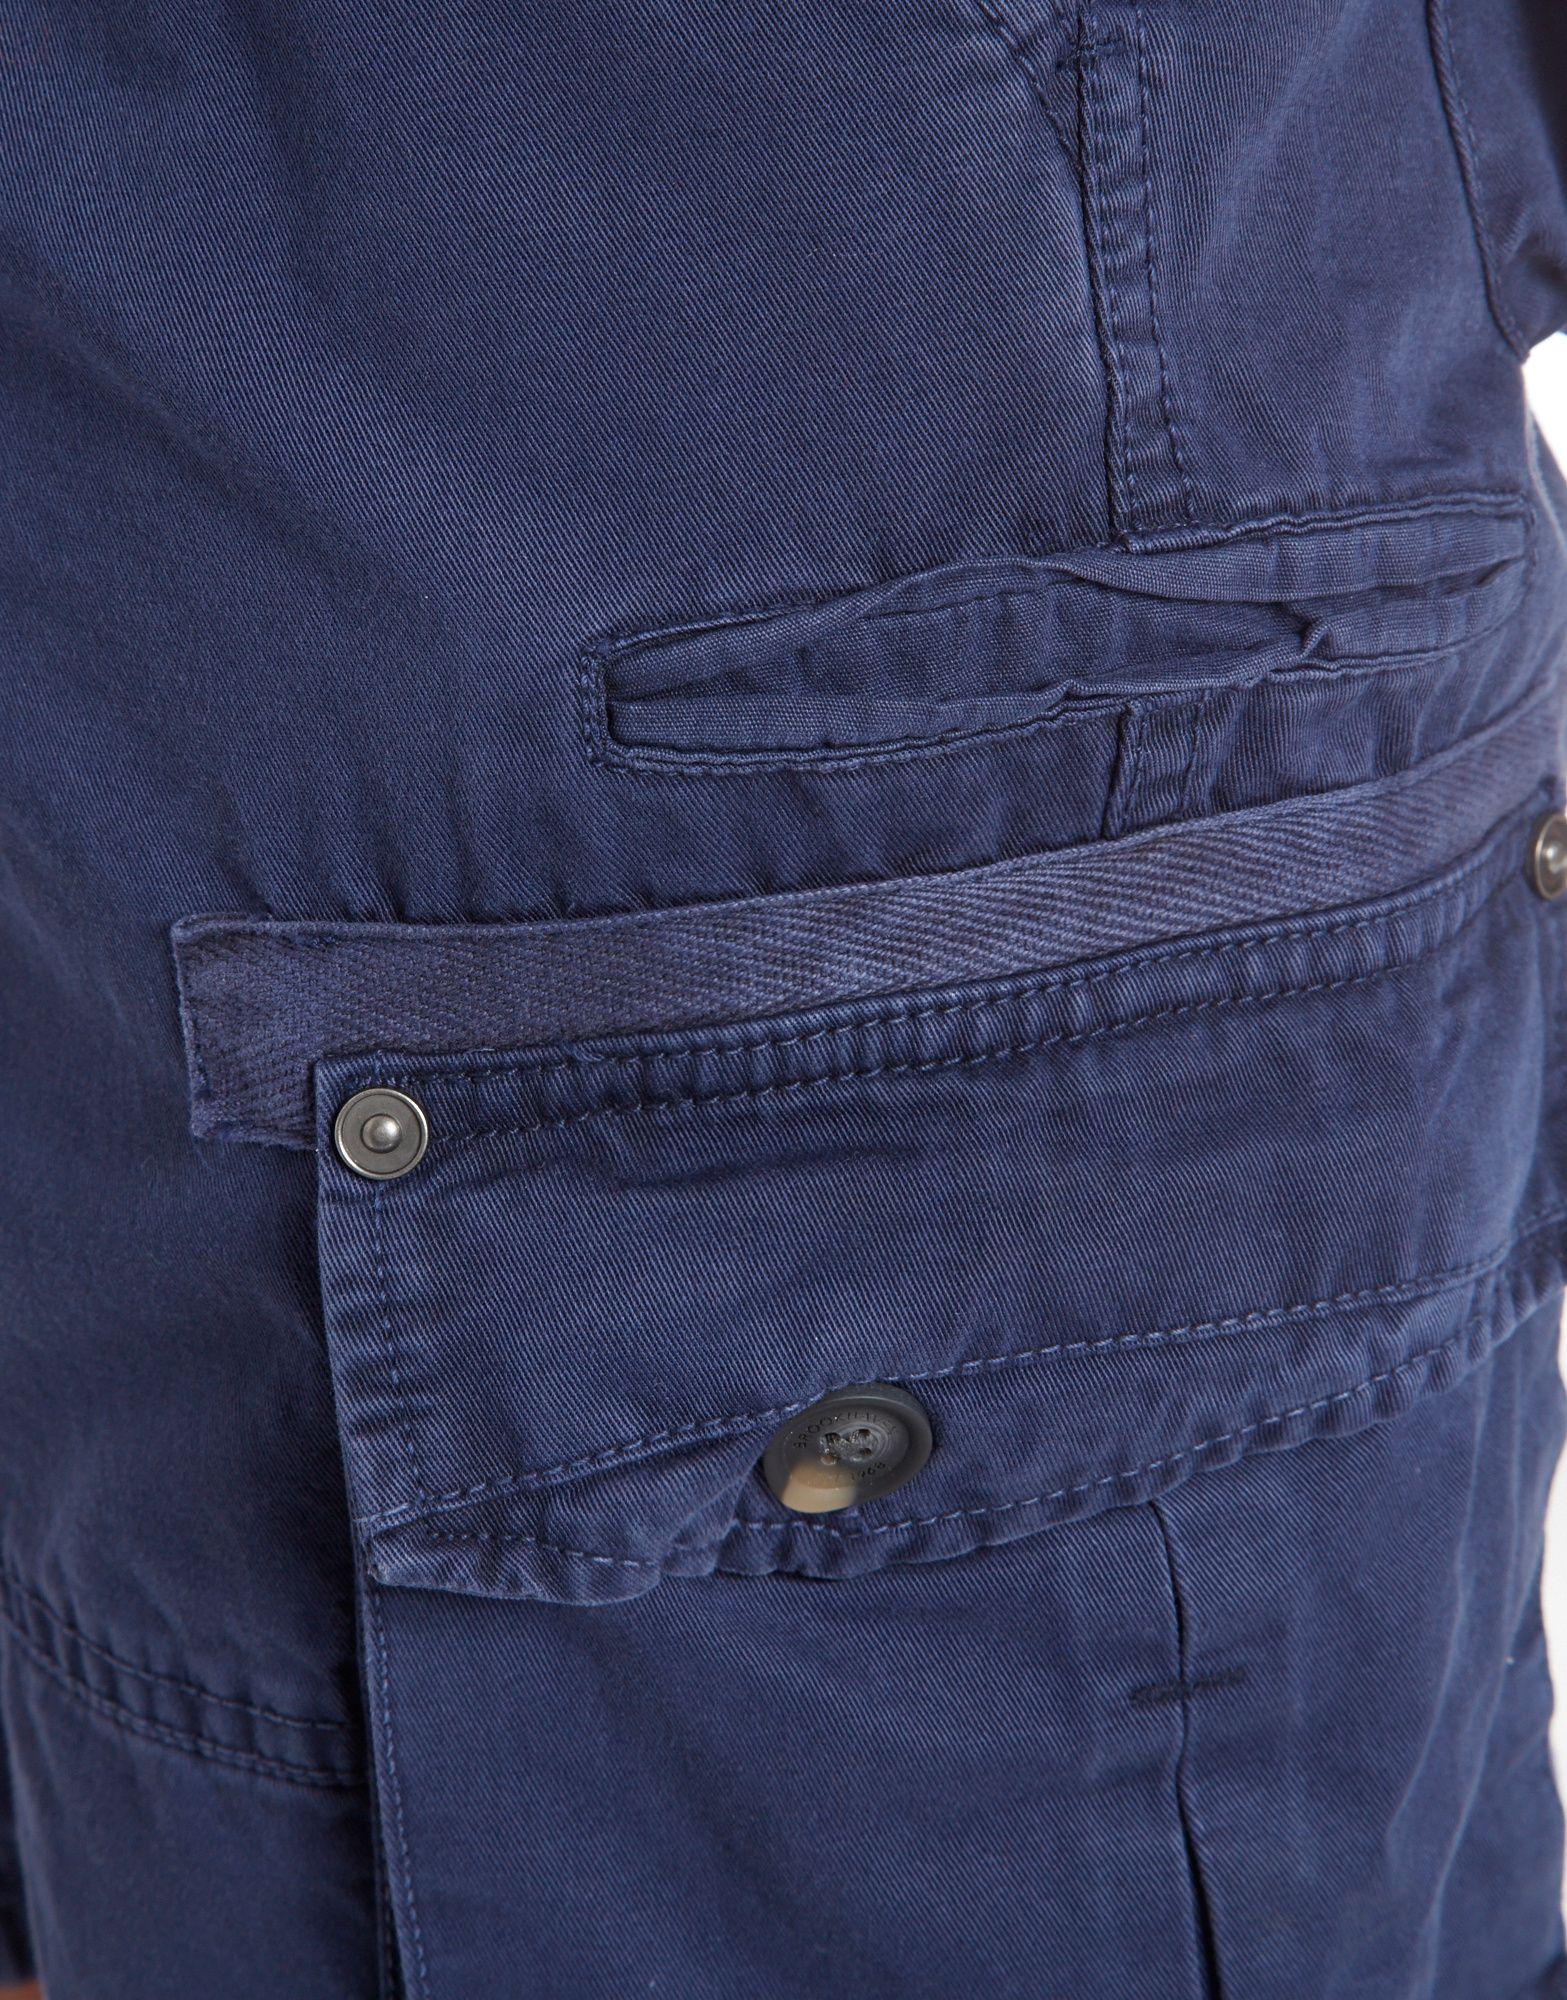 Brookhaven Watkins Cargo Shorts